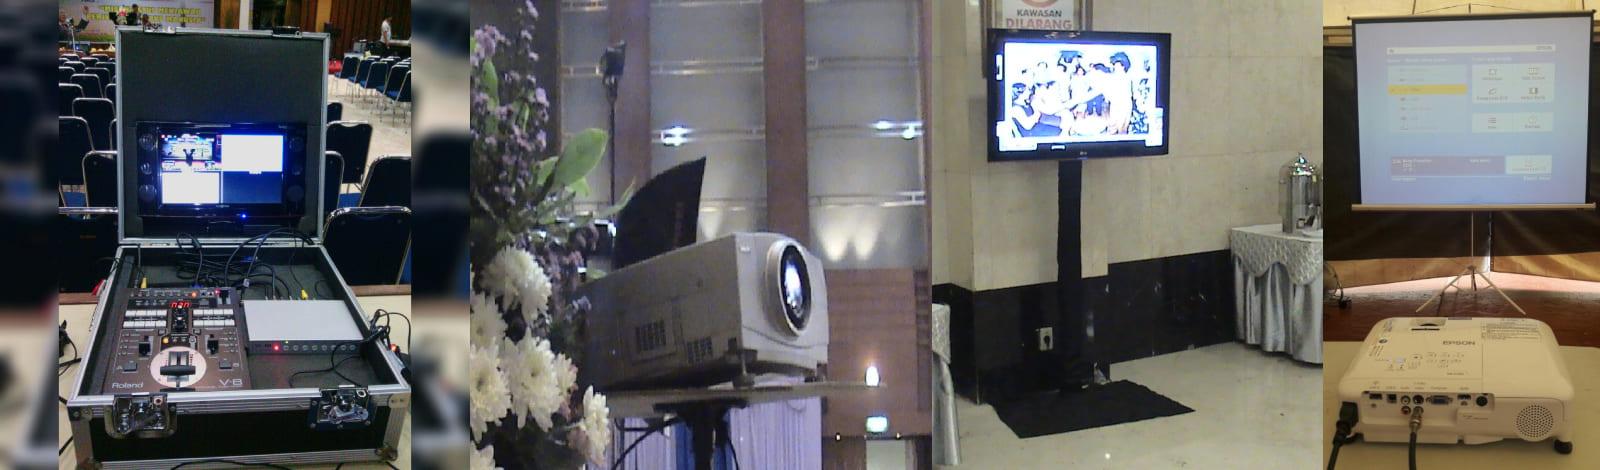 Sewa Multimedia, screen lcd projector, proyektor Epson EB-X100, EB-X200, EB-X350, 2.000 lumen, 2.600, 3.000, 3.200, 5.000 ansi, 10.000 lumen, layar Infocus, tripod, 1 meter, 2x2, 3x4, Handycam, camcorder, led tv 65 inch, plasma tv 42, 50, 60 inch, tv matador, tv lantai, tv monitor, standing bracket tv, kabel vga, kabel hdmi, kabel rca, kabel bnc, kabel sdi, Edirol Rolland V8, switcher, mixer video 4 input, 8 channel, splitter.